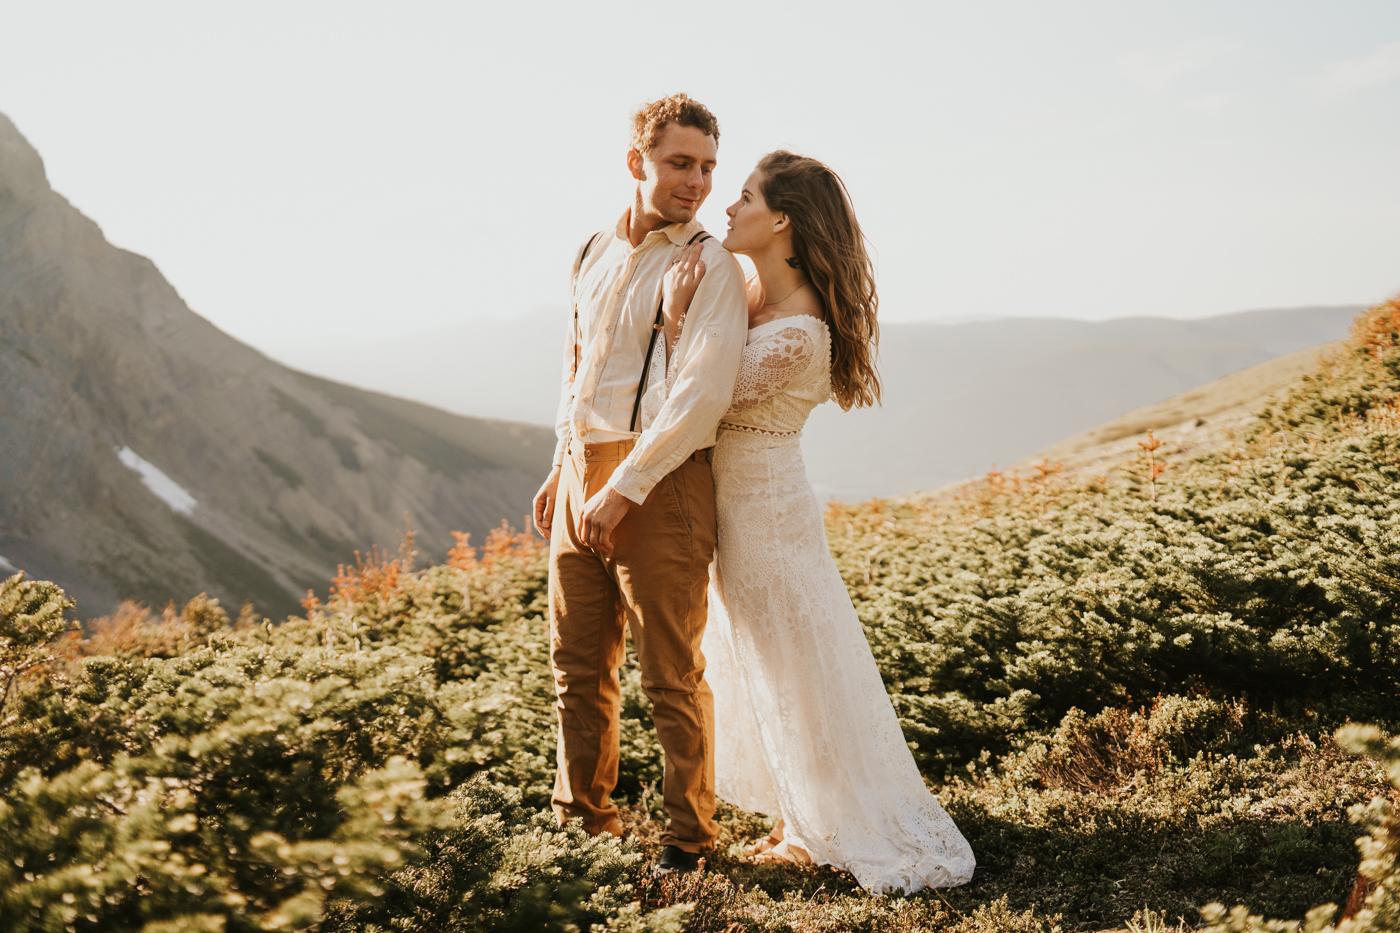 tyraephotography_photographer_wedding_elopement_engagement_photography-08357.jpg